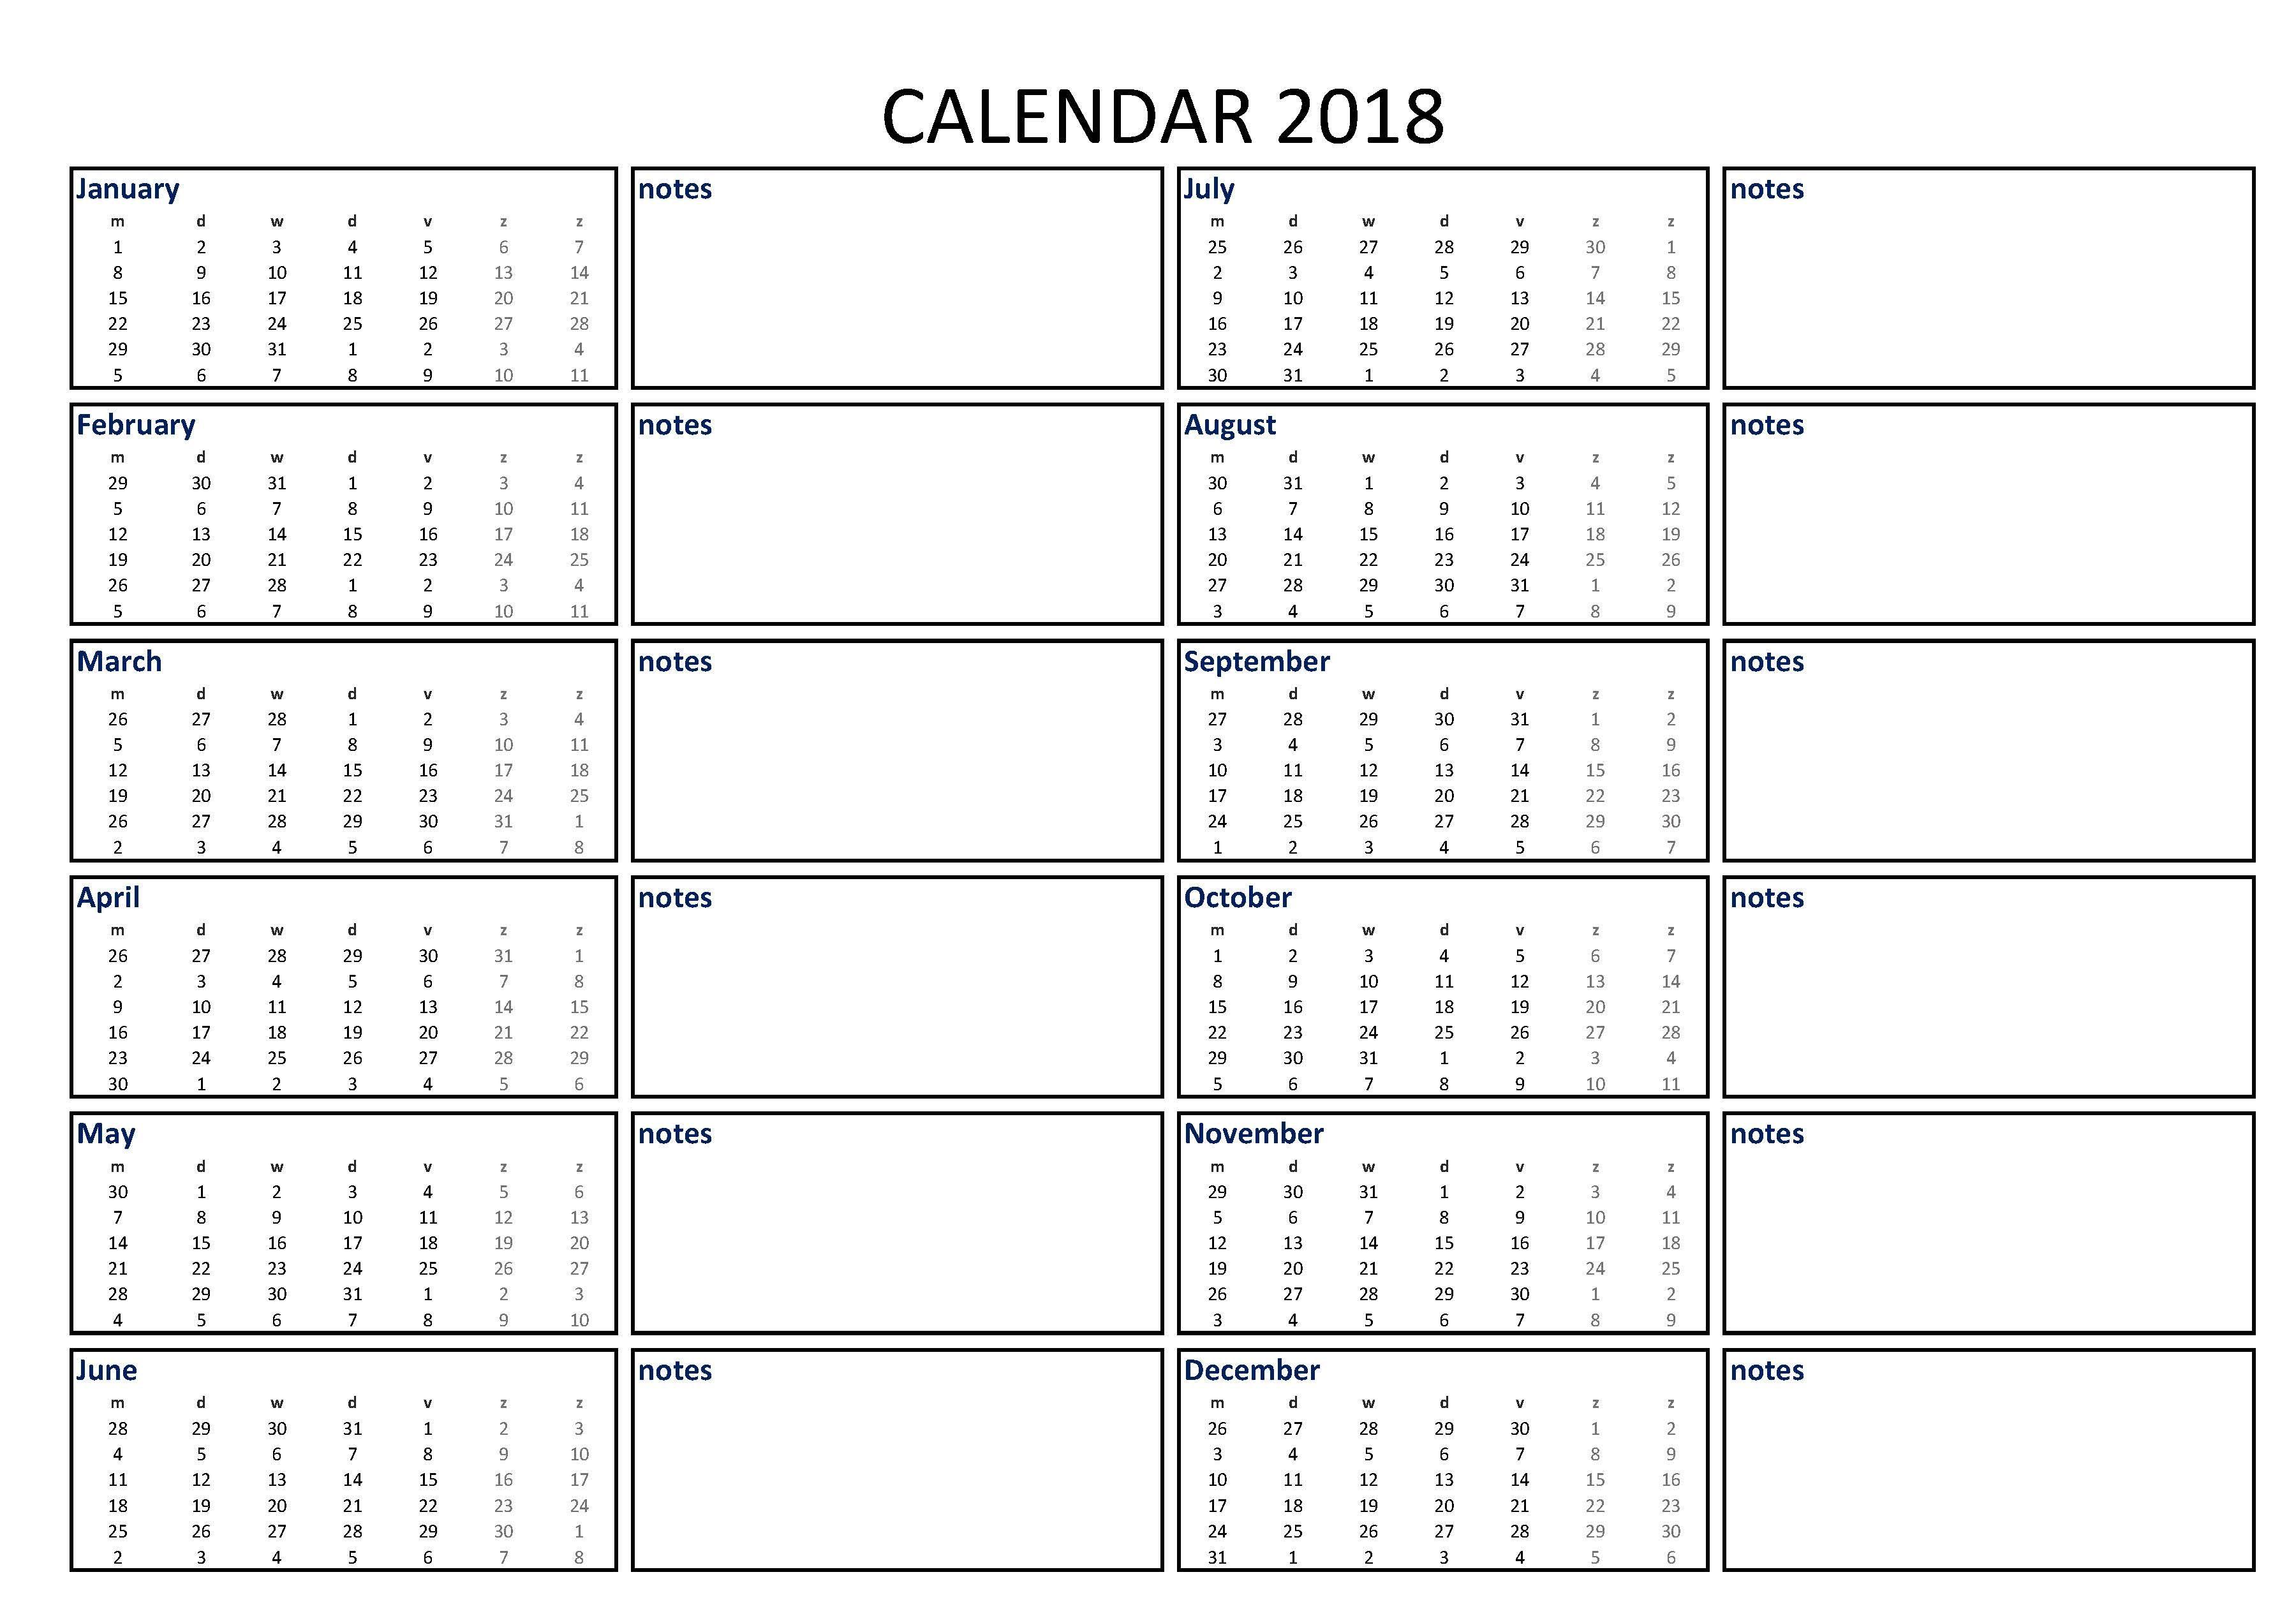 Calendar Excel A3 With Notes